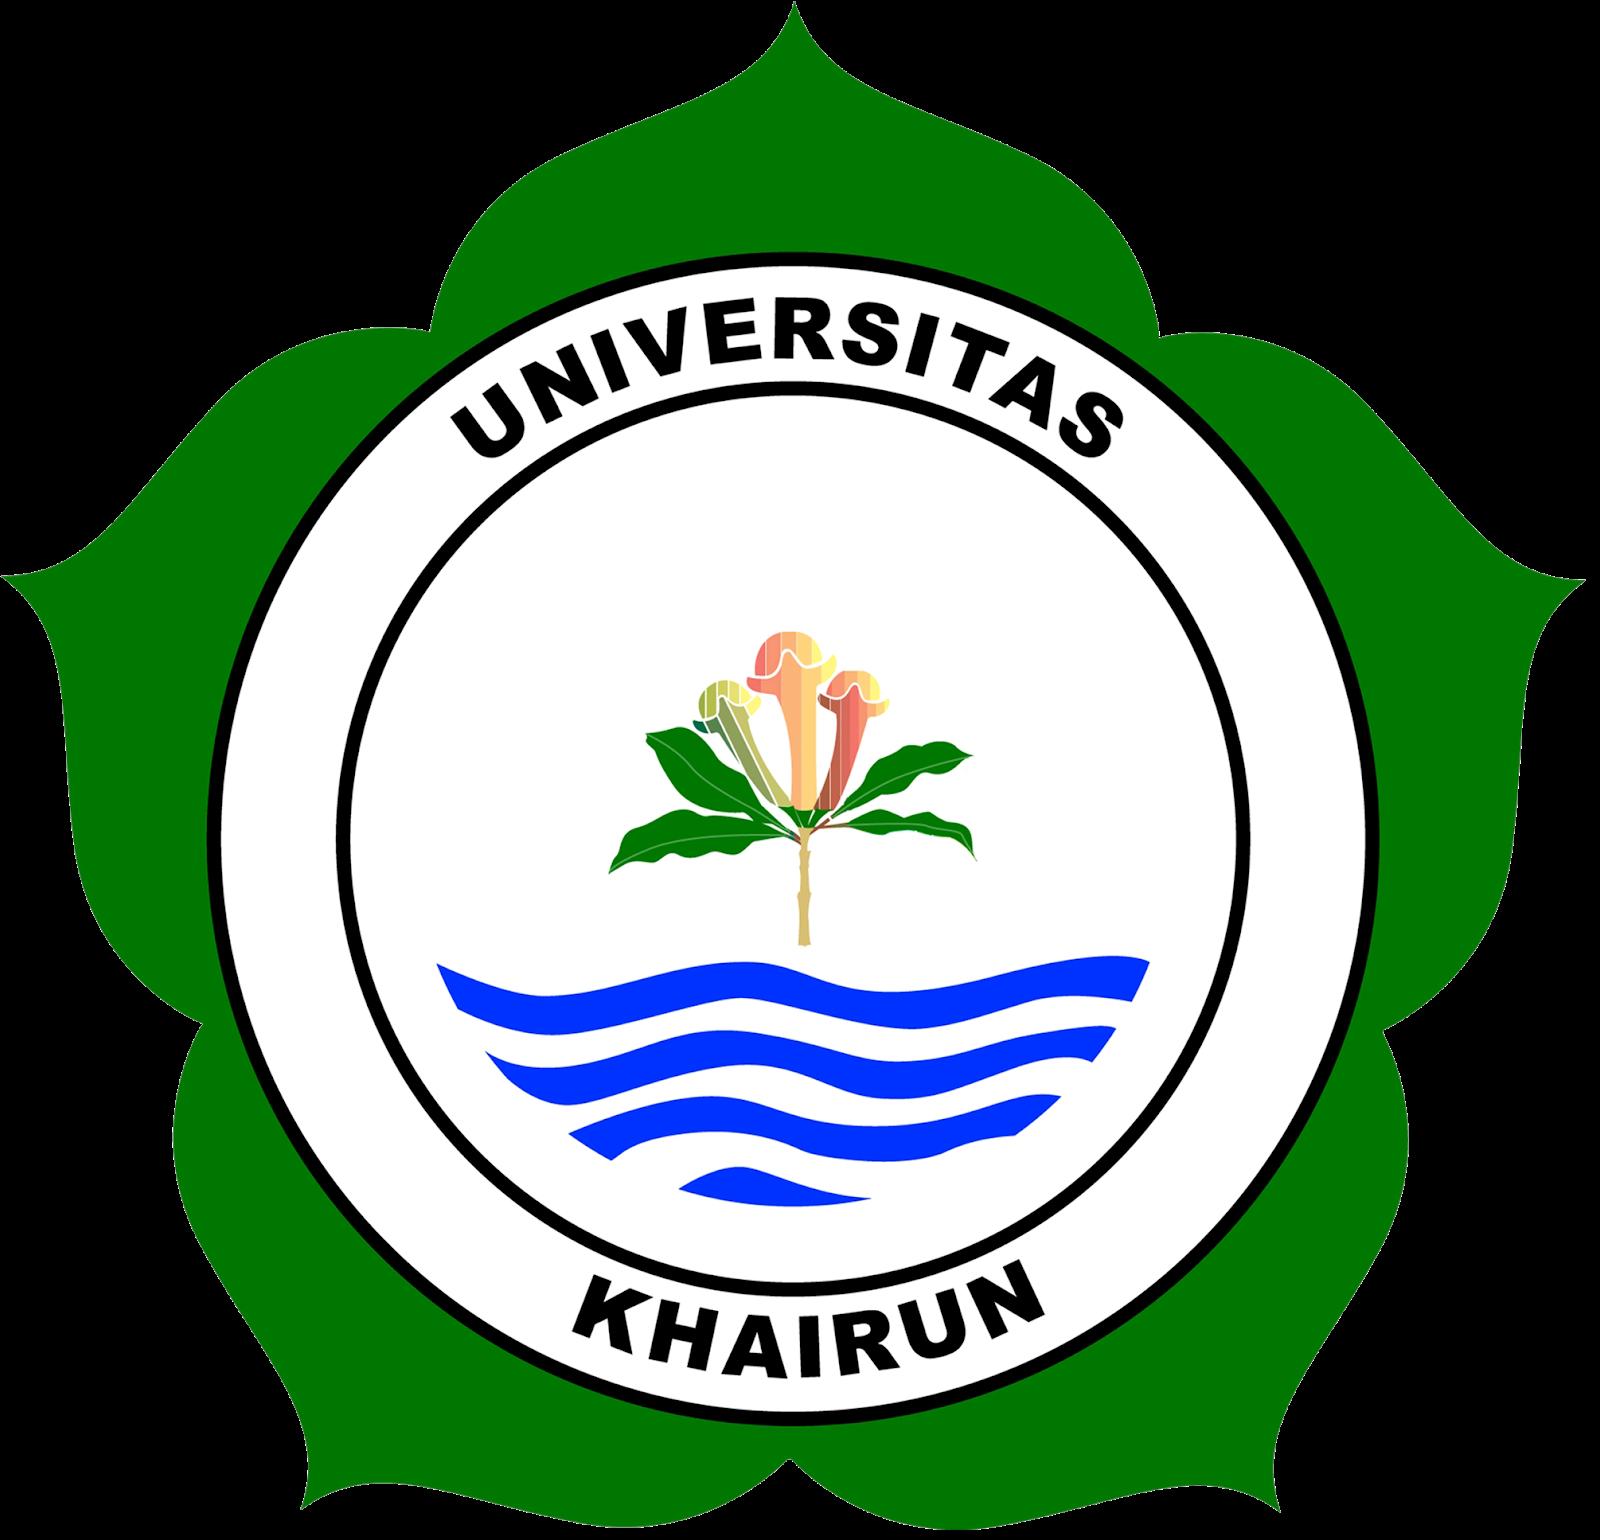 logo universitas khairun